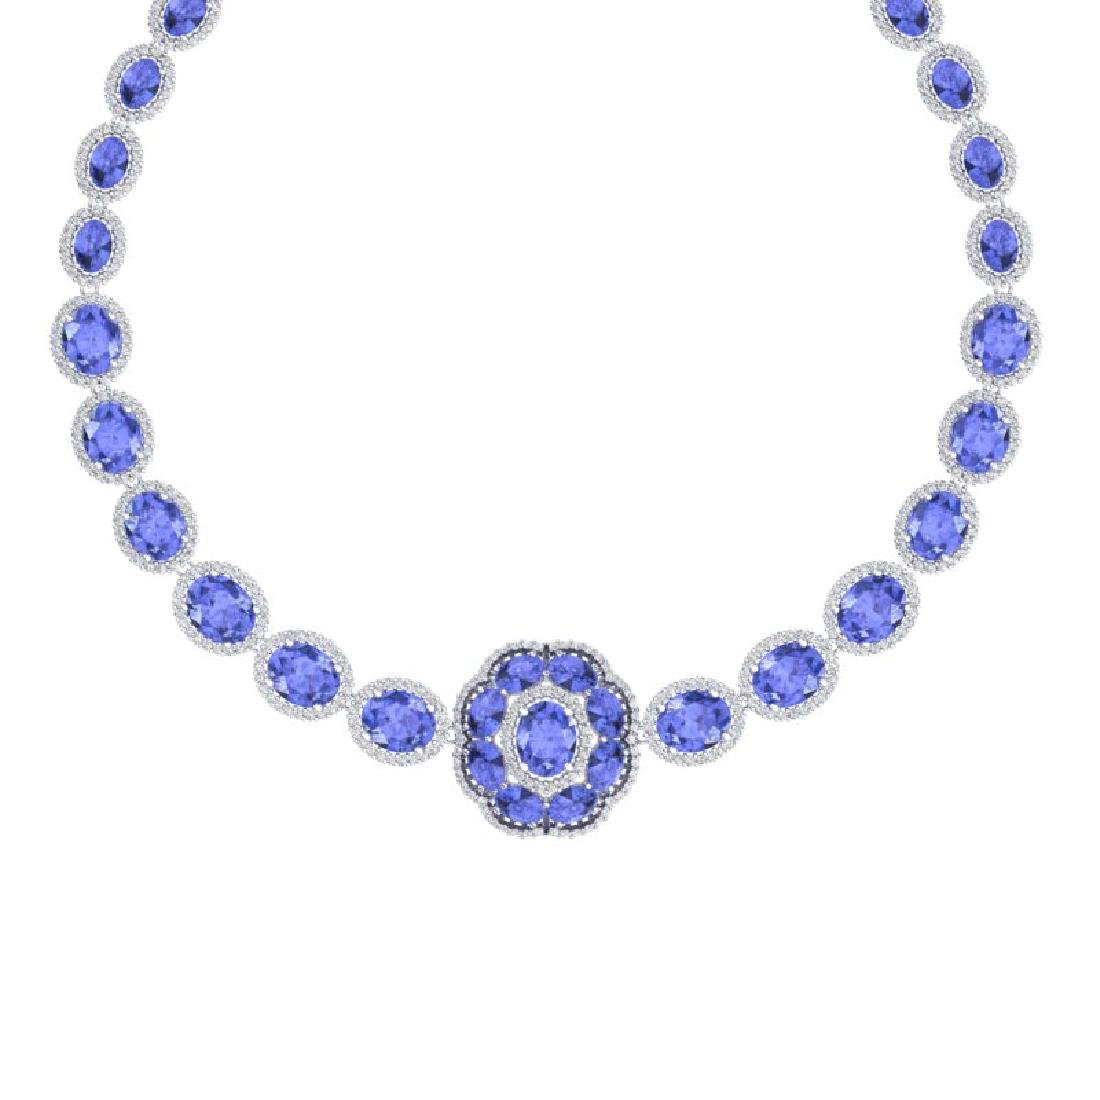 55.84 CTW Royalty Tanzanite & VS Diamond Necklace 18K - 2